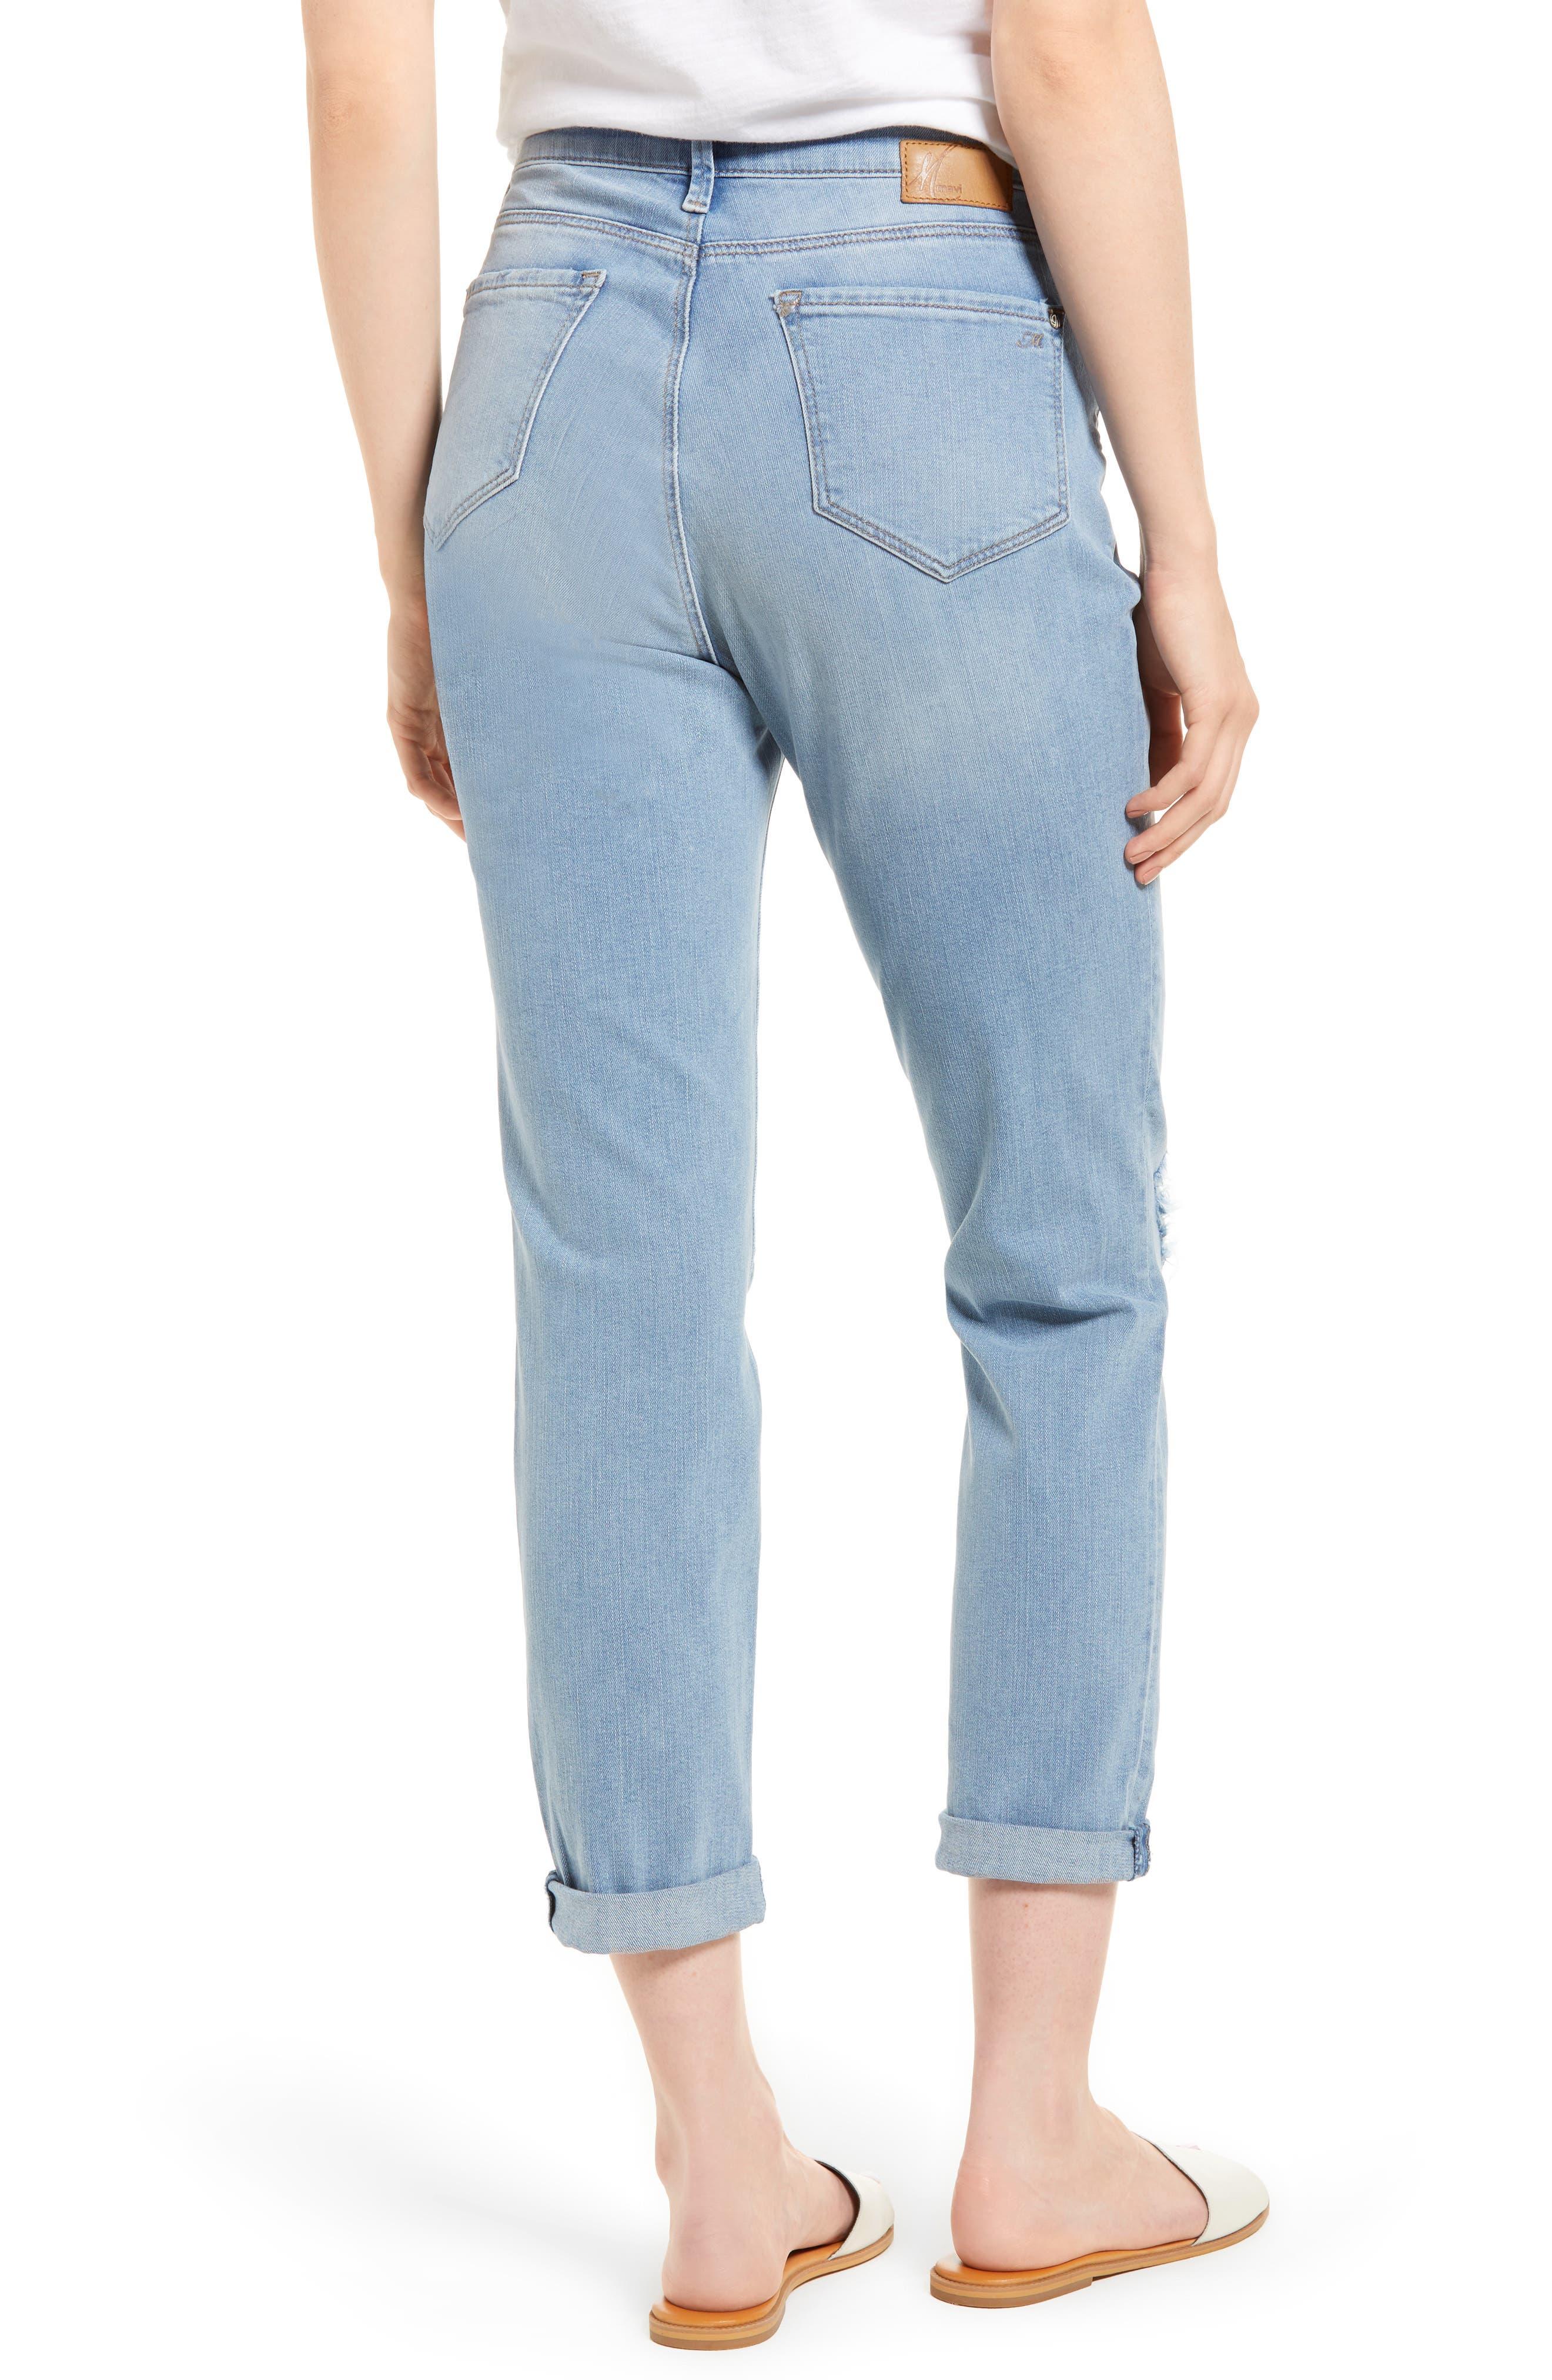 Lea Boyfriend Ripped Jeans,                             Alternate thumbnail 2, color,                             Light Ripped Vintage